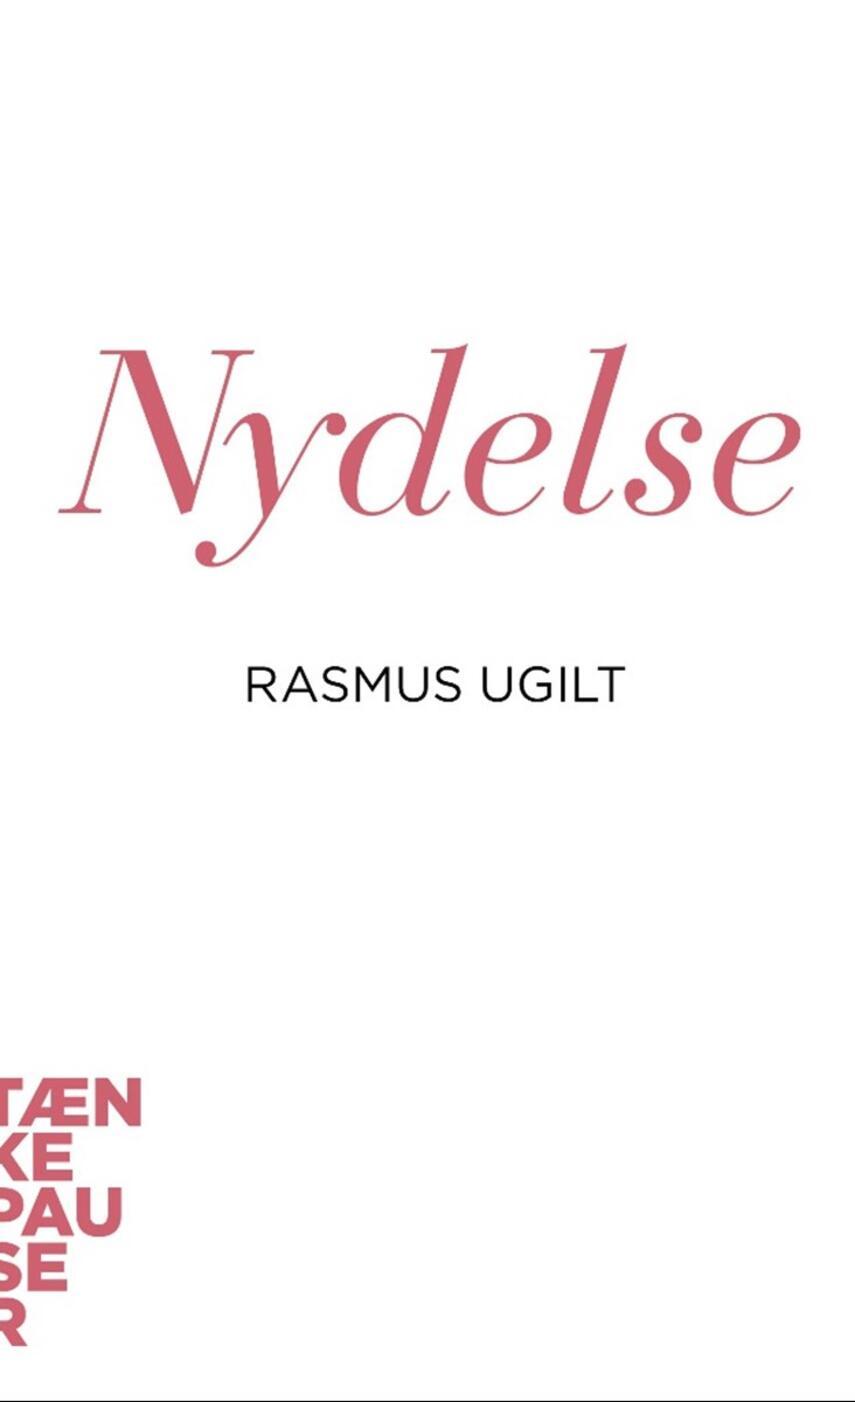 Rasmus Ugilt: Nydelse